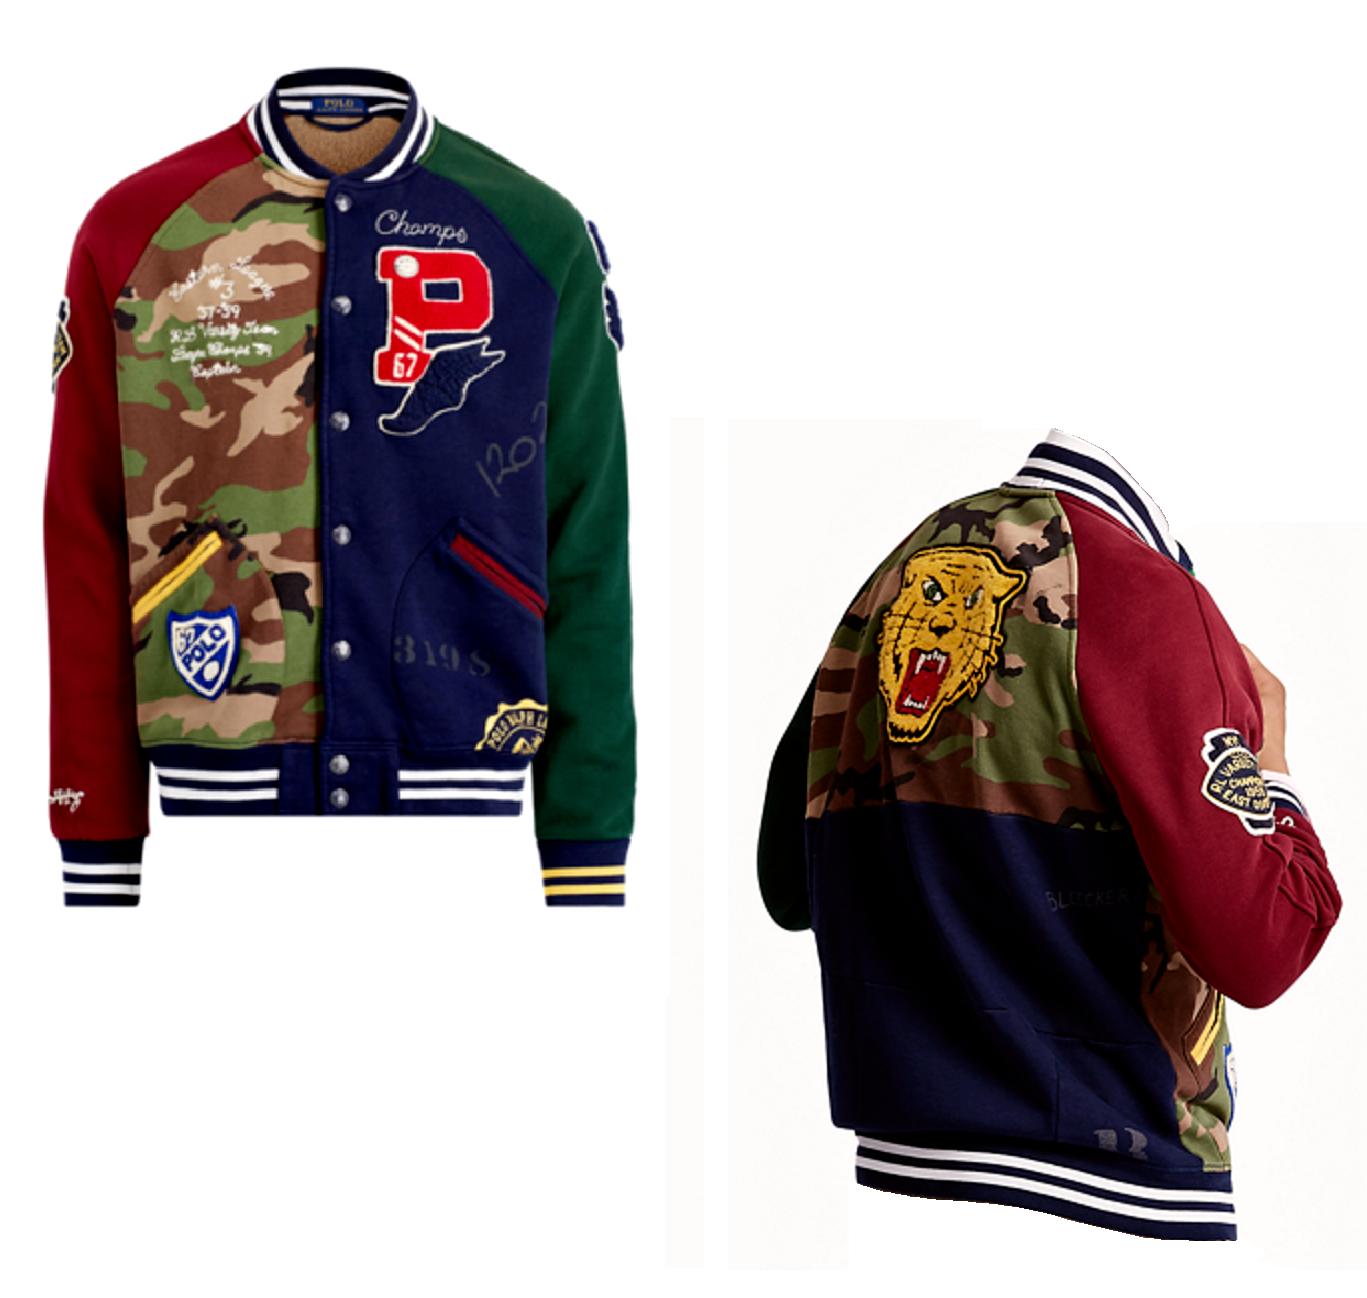 d18327cf26ff Polo Ralph Lauren Camo Varsity Letterman Patchwork Stadium Tiger Patch  Jacket XL фото